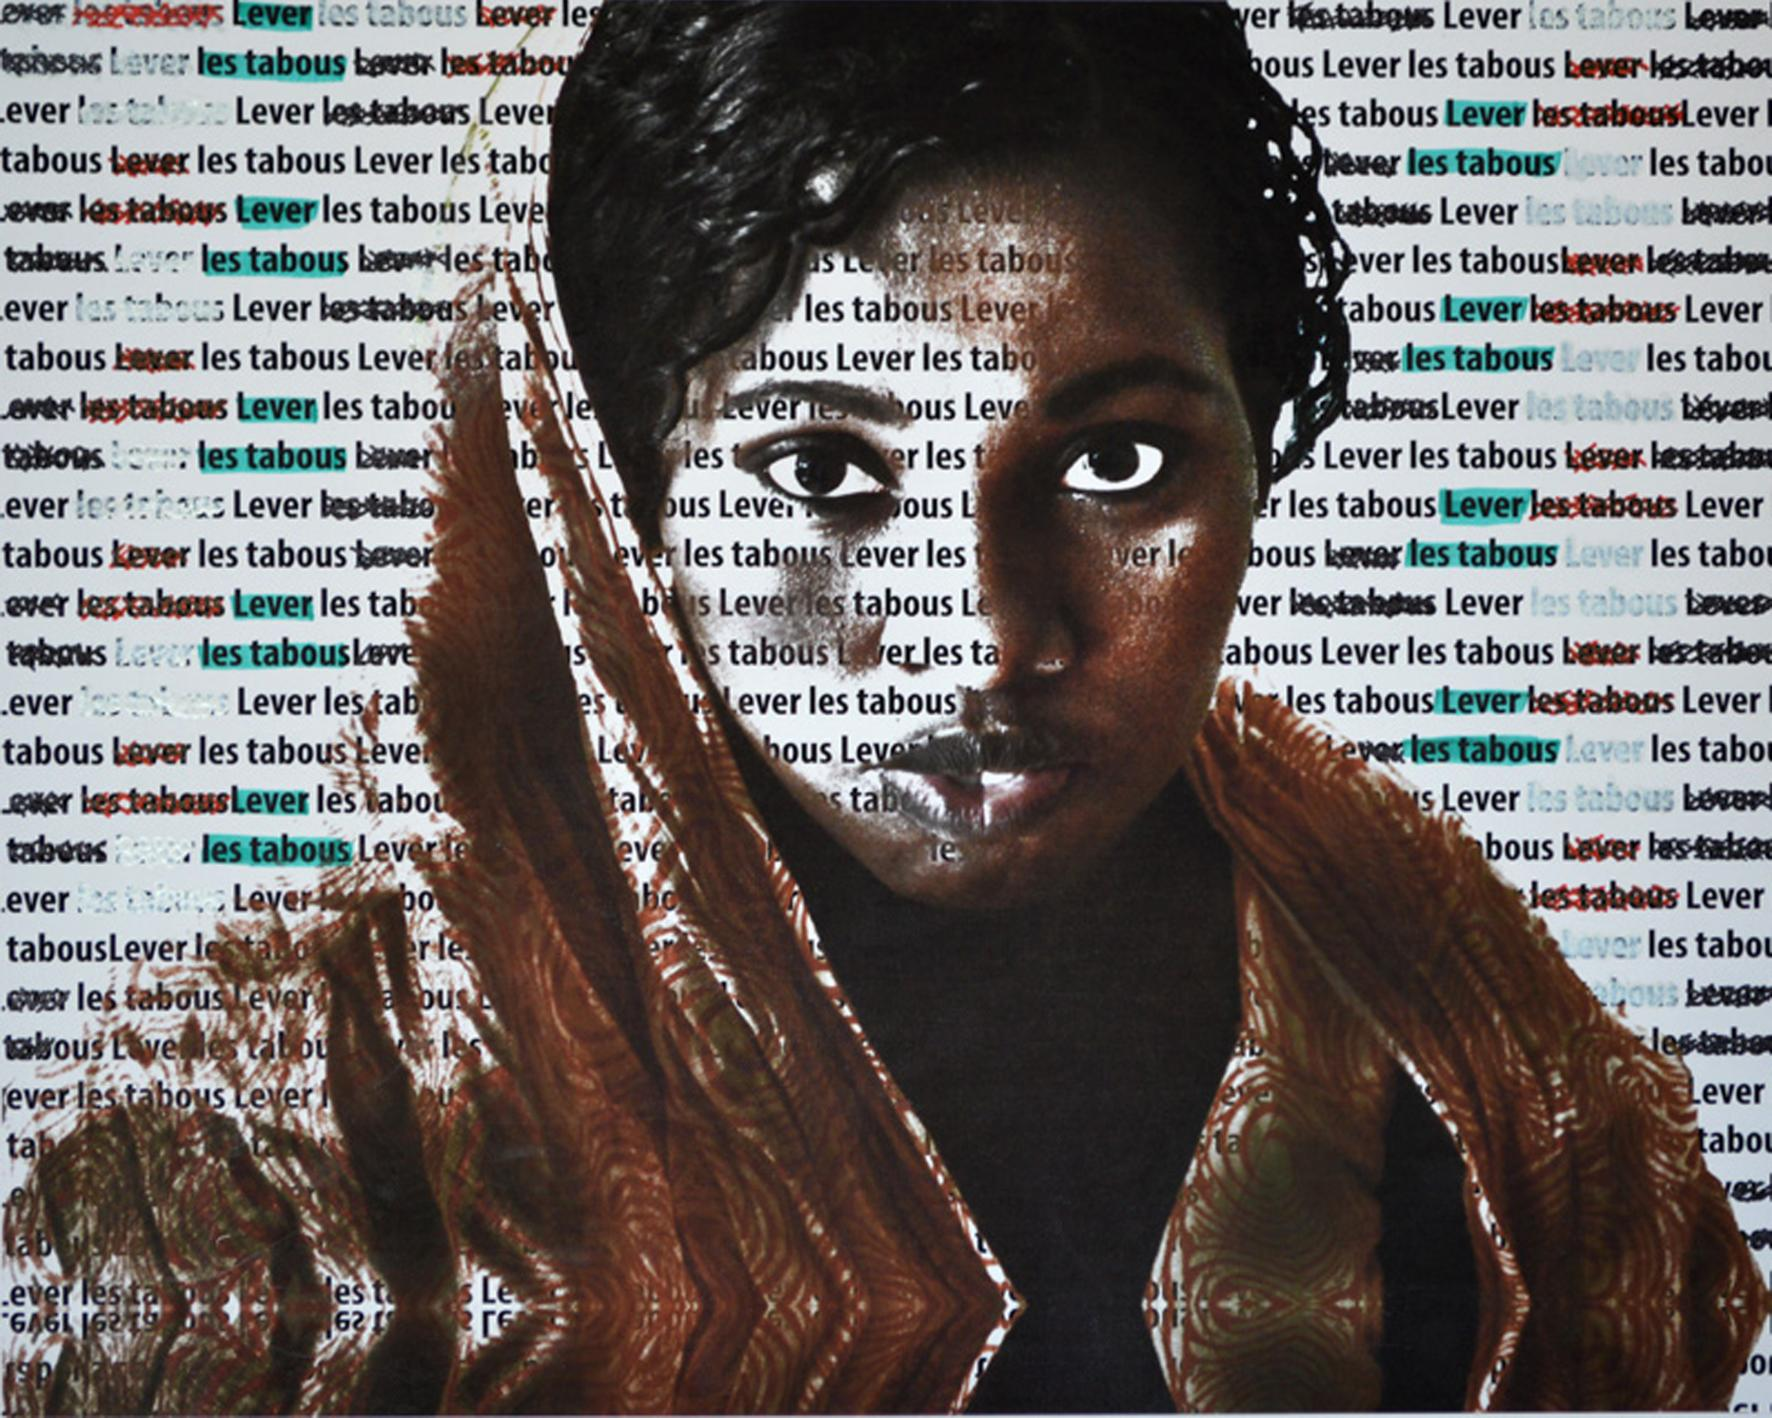 Lévez les tabous - Briser le silence (2017) - May San Alberto